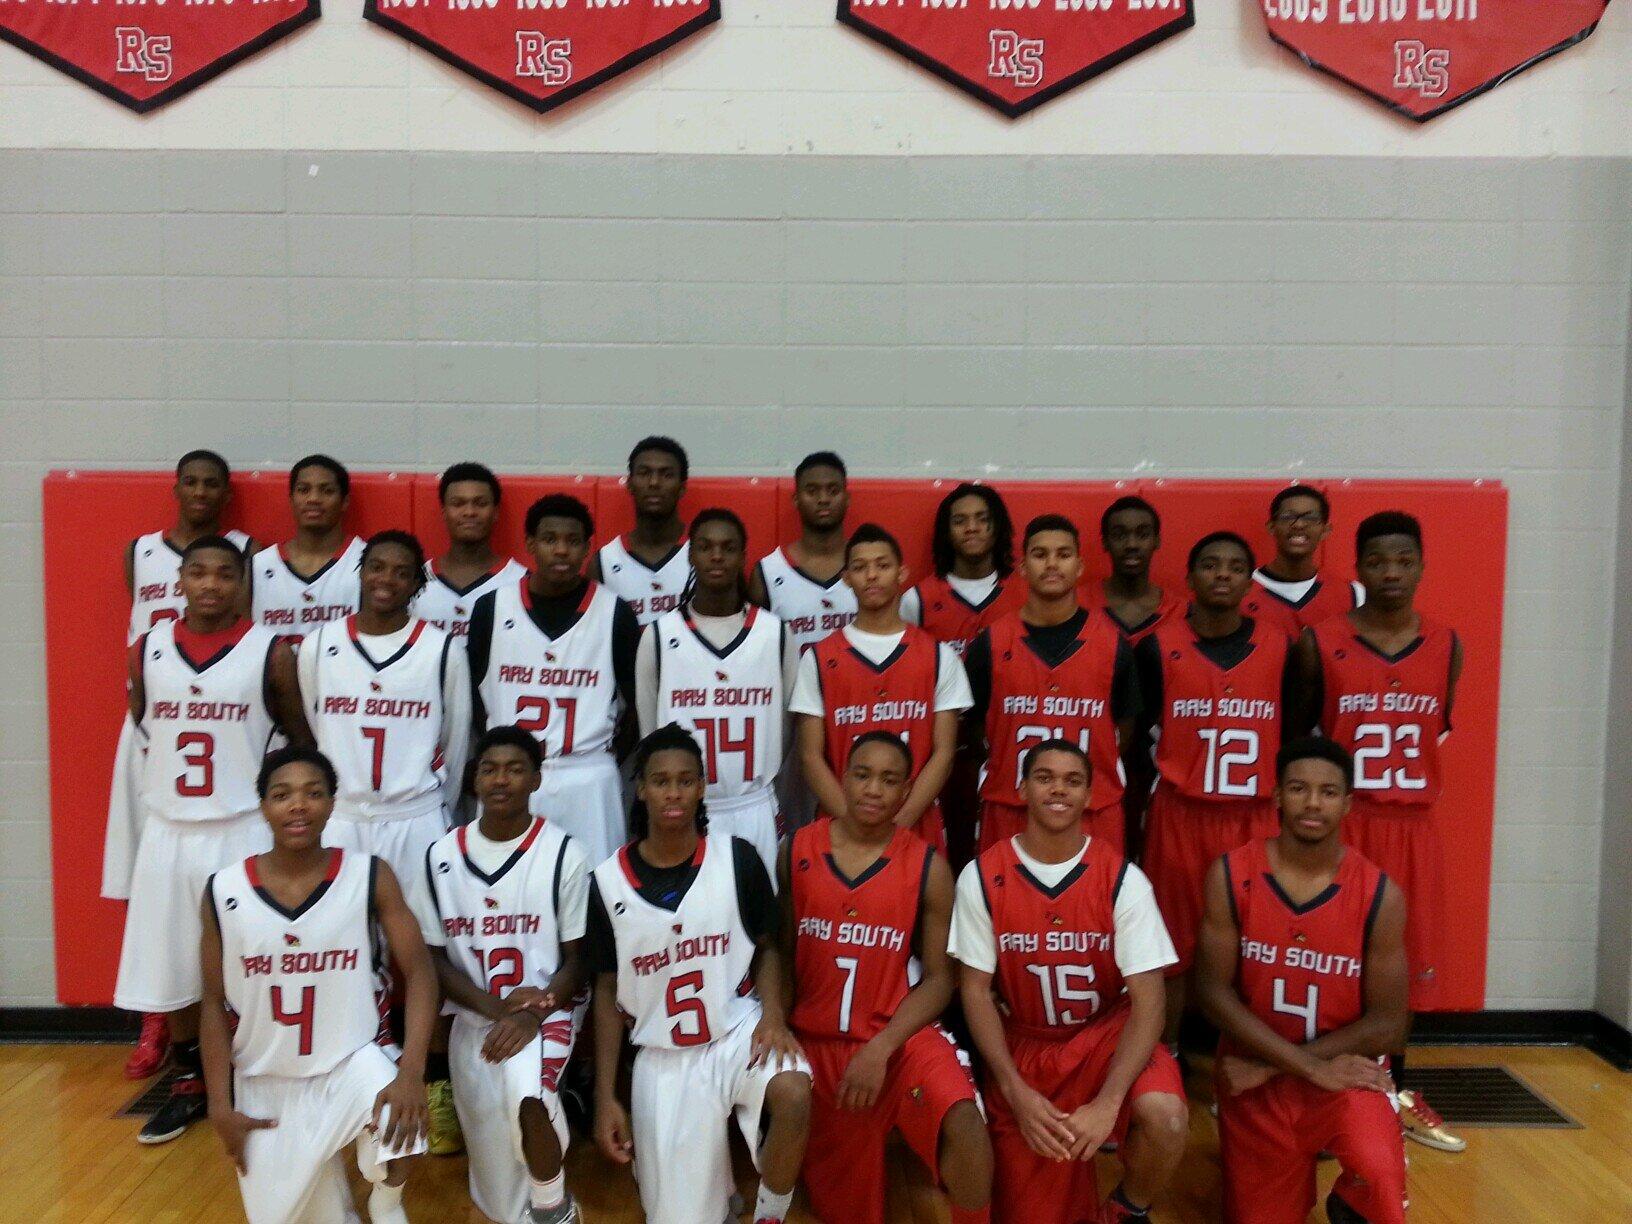 Ray South Basketball (@raysouthBBALL) | Twitter